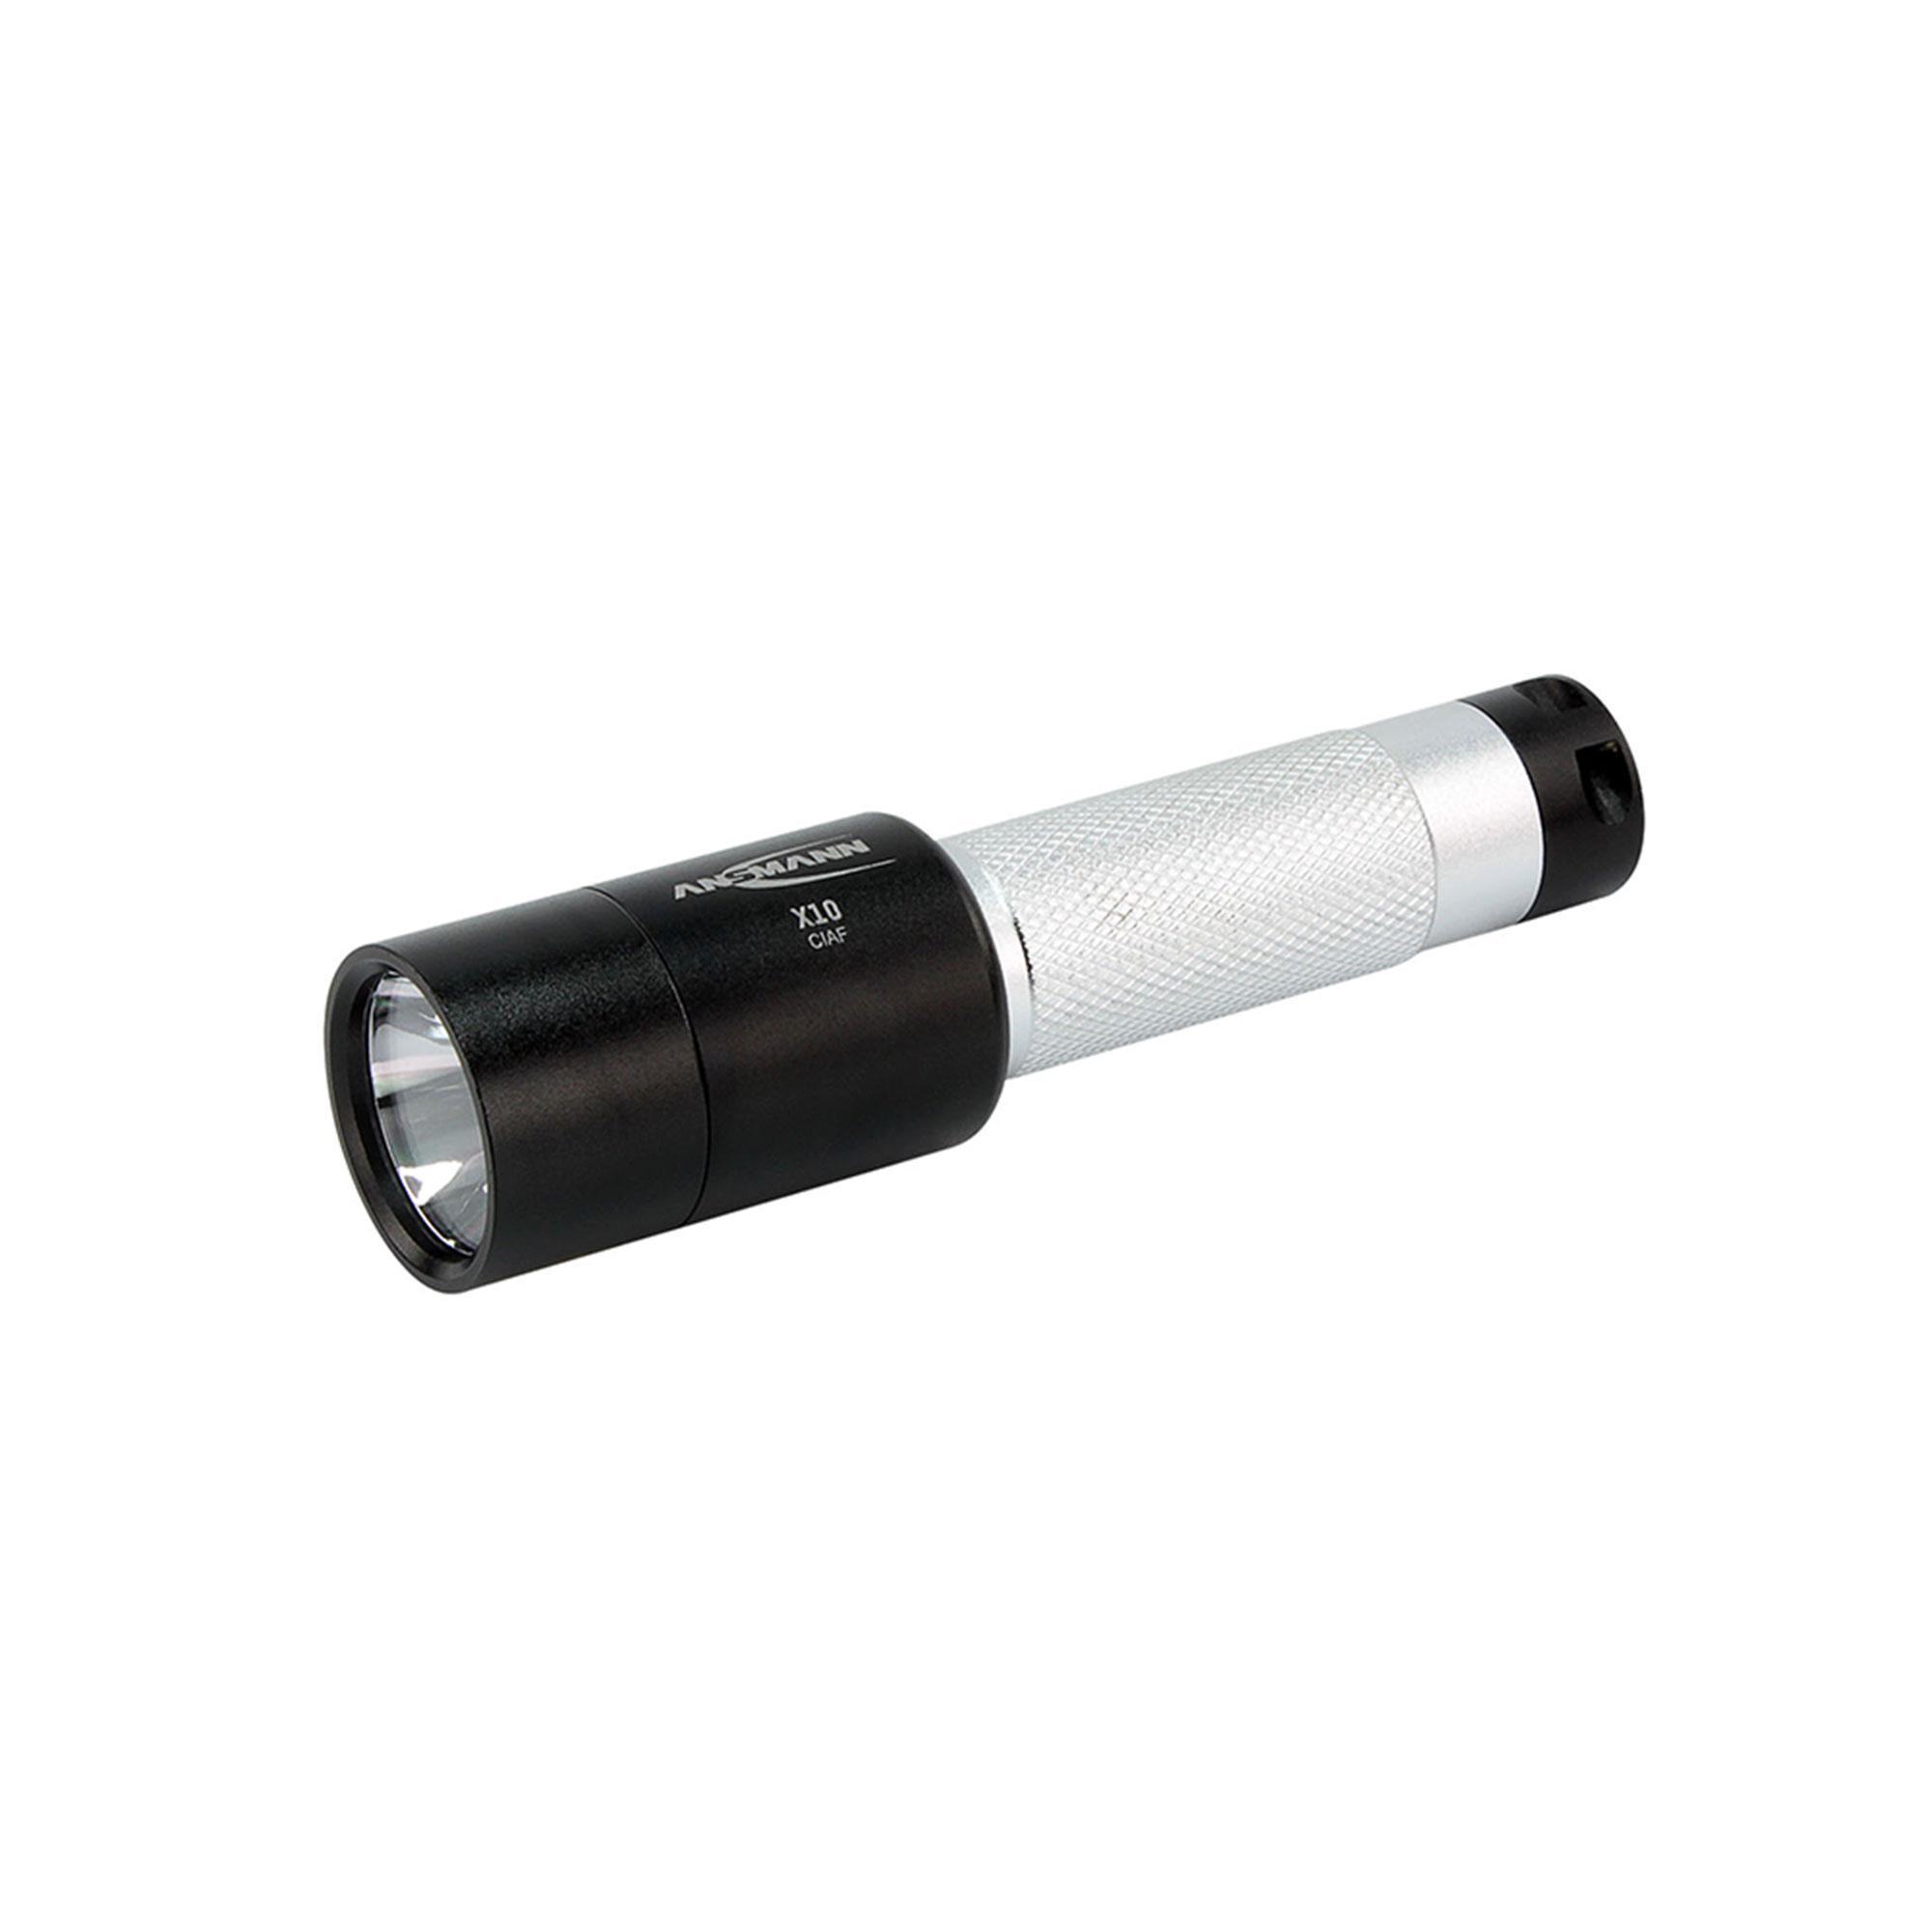 Afbeelding van 4013674106929 LED zaklamp 200Lm